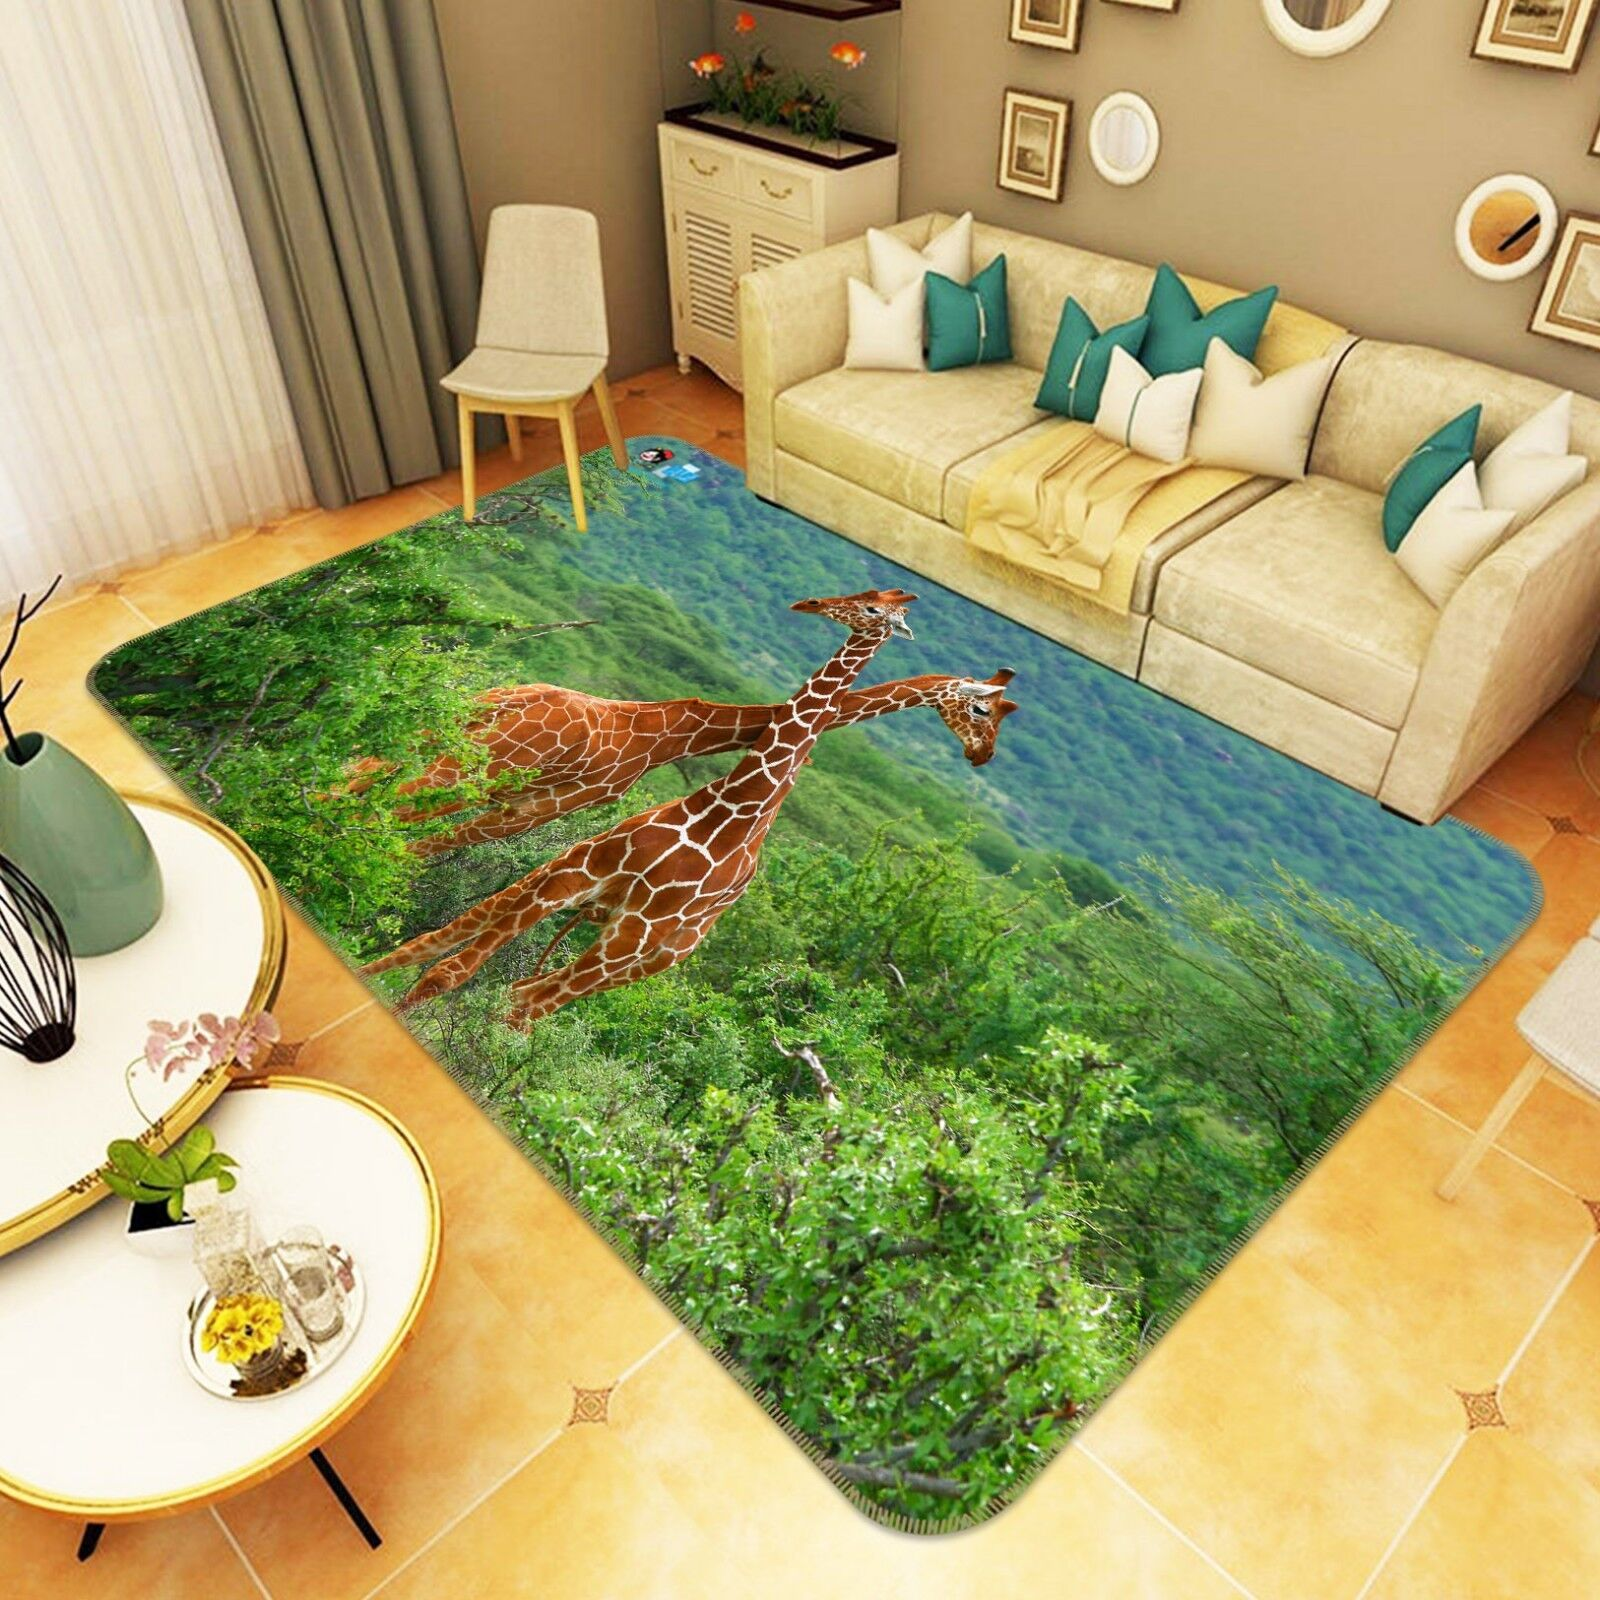 3D Giraffe 204 tappetino antiscivolo tappeto camera Tappetino Qualità Elegante foto Tappeto UK Estate